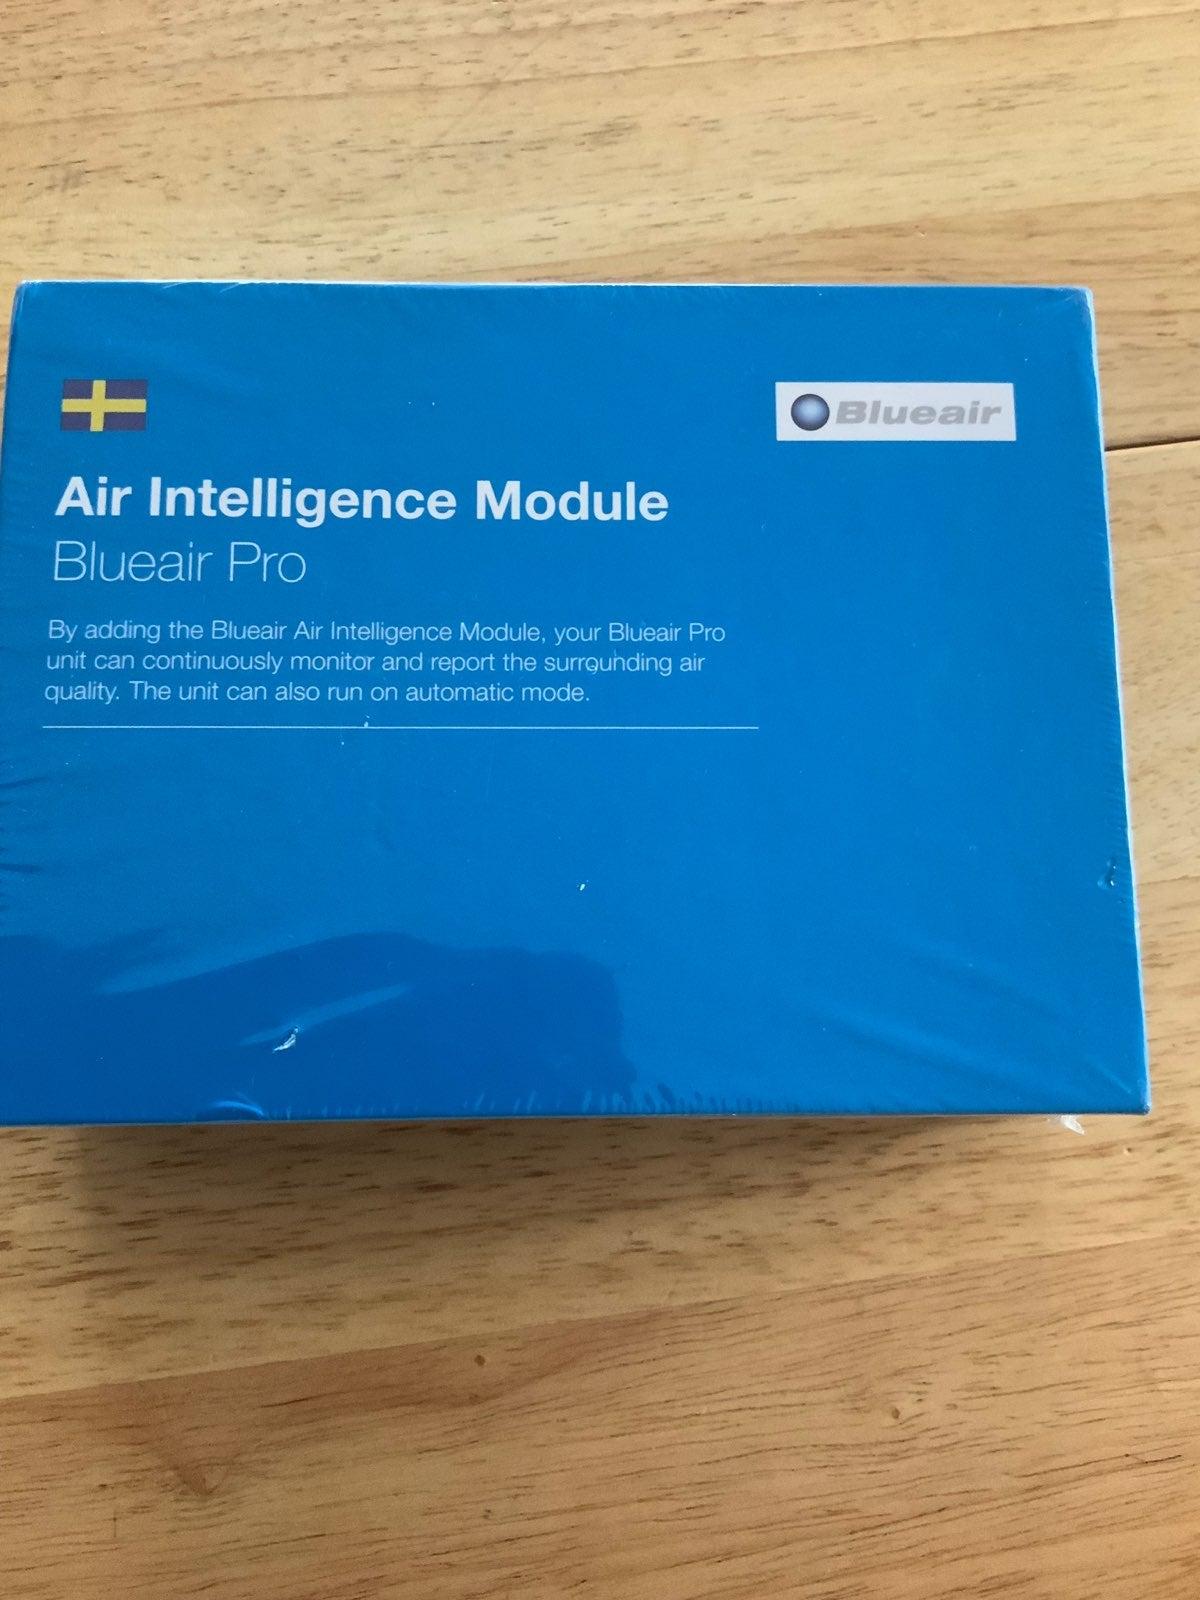 Blueair Pro Air Intelligence Module